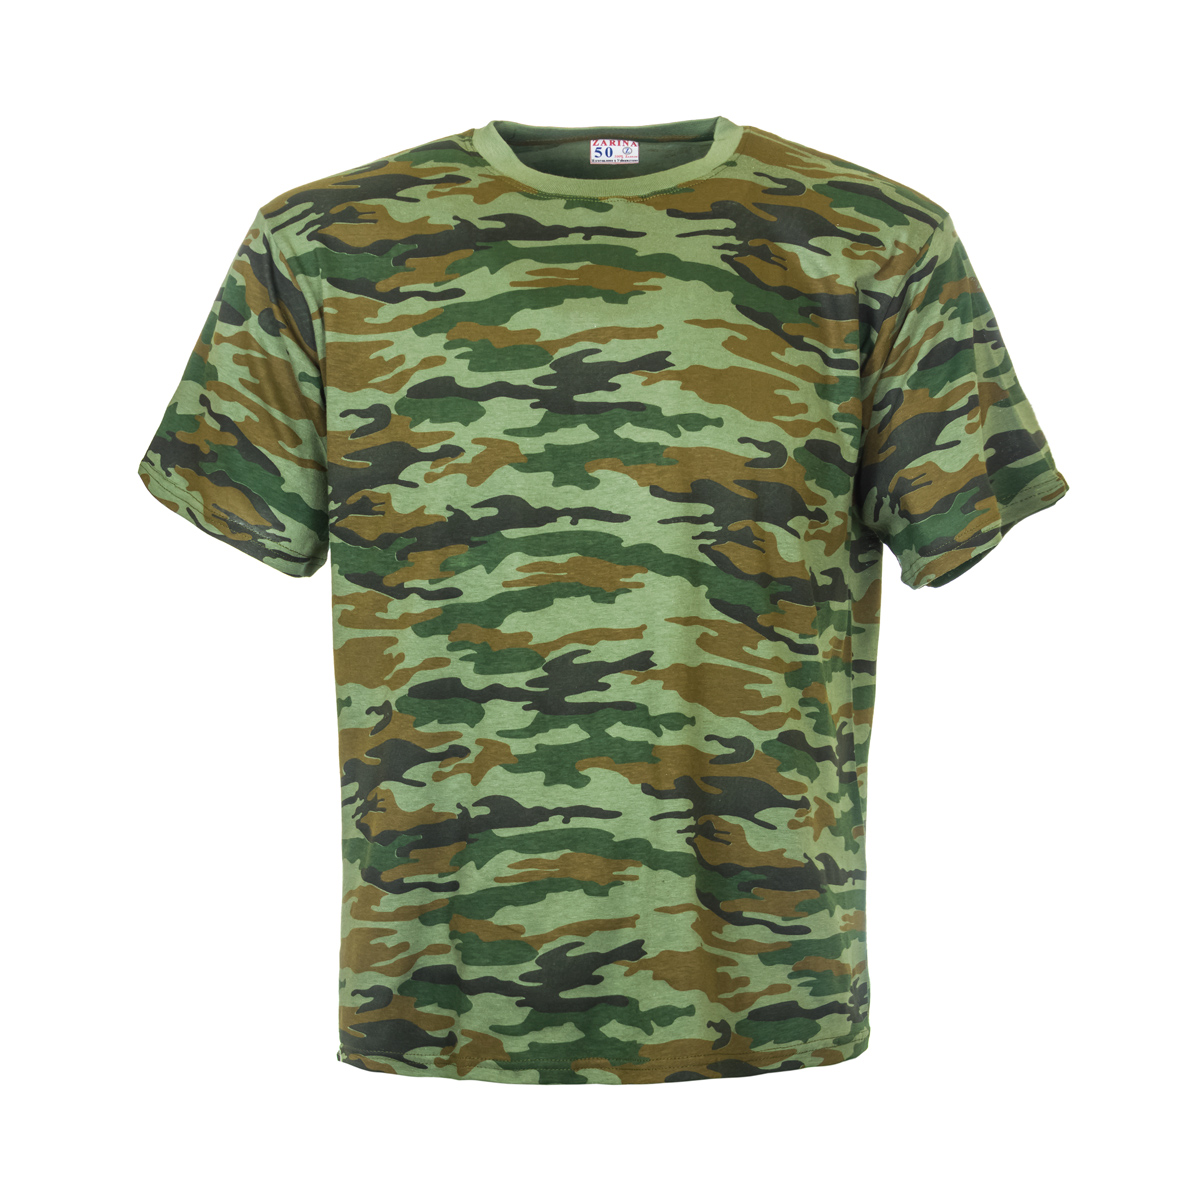 Муж. футболка Камуфляж р. 54Майки и футболки<br>Фактический ОГ:106 см<br>Фактический ОТ:106 см<br>Фактический ОБ:108 см<br>Длина по спинке:76 см<br>Рост:178-184 см<br><br>Тип: Муж. футболка<br>Размер: 54<br>Материал: Кулирка